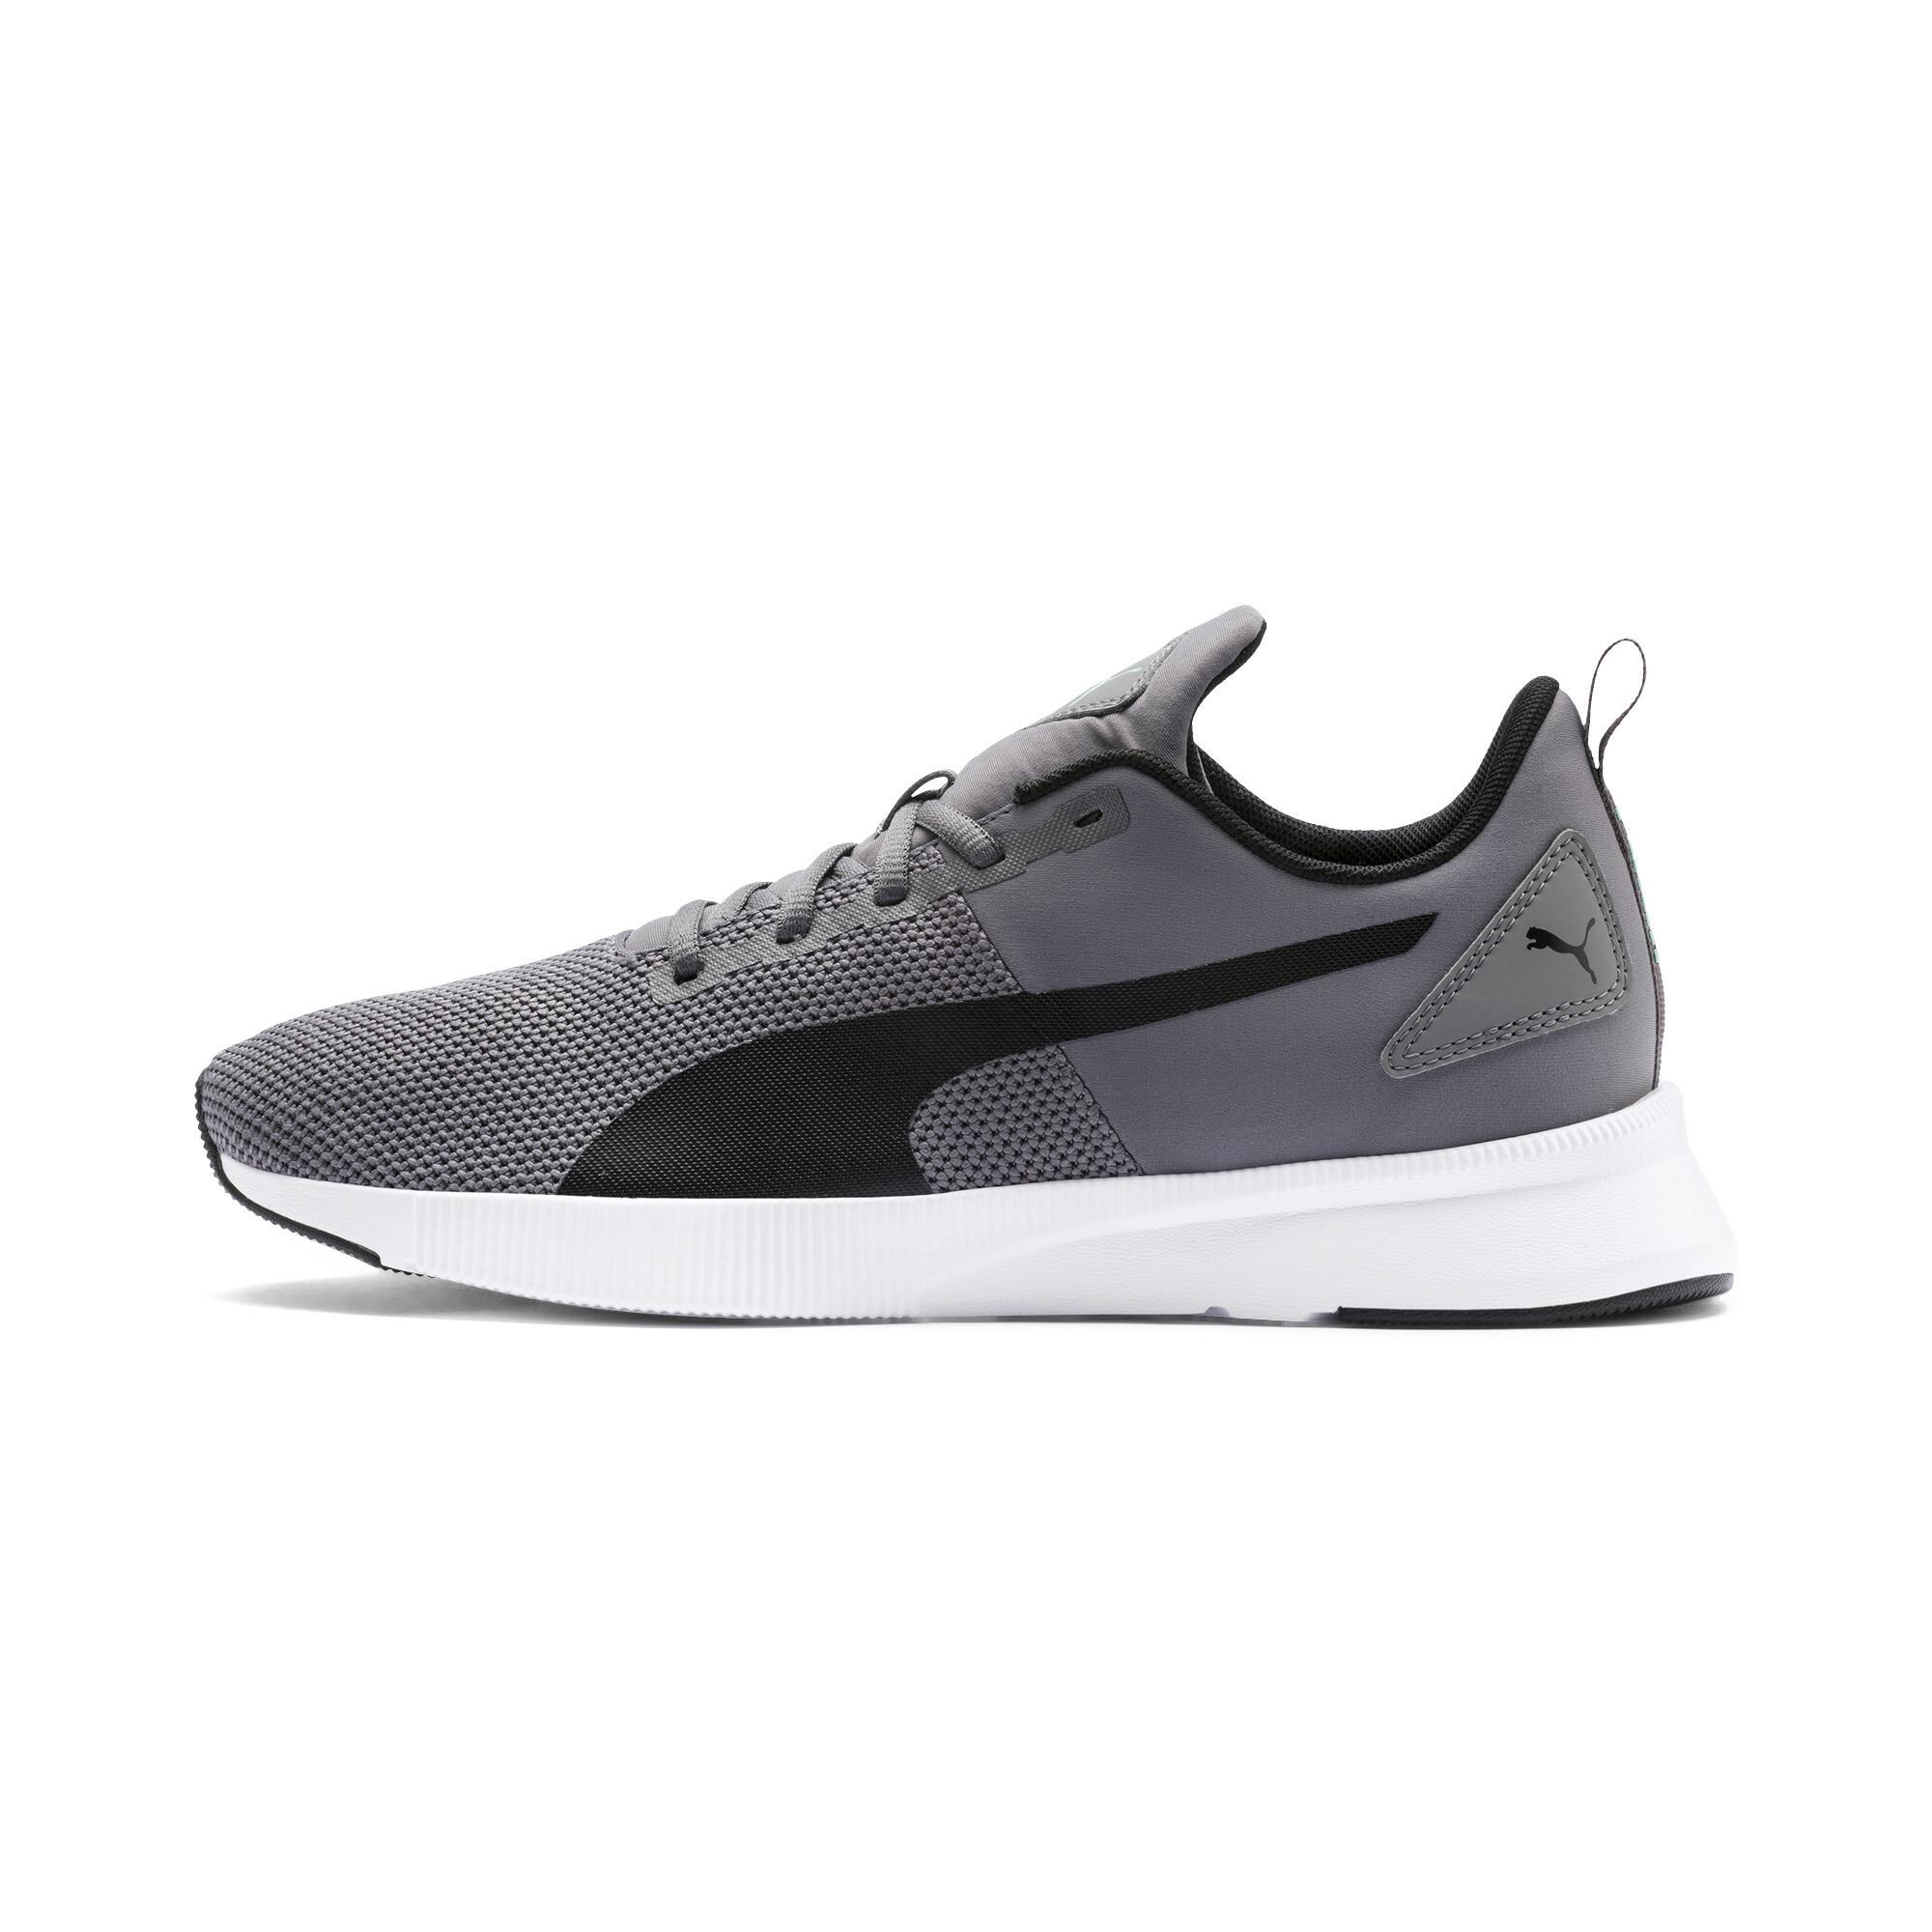 PUMA-Flyer-Runner-Running-Shoes-Mens-Shoe-Running thumbnail 16